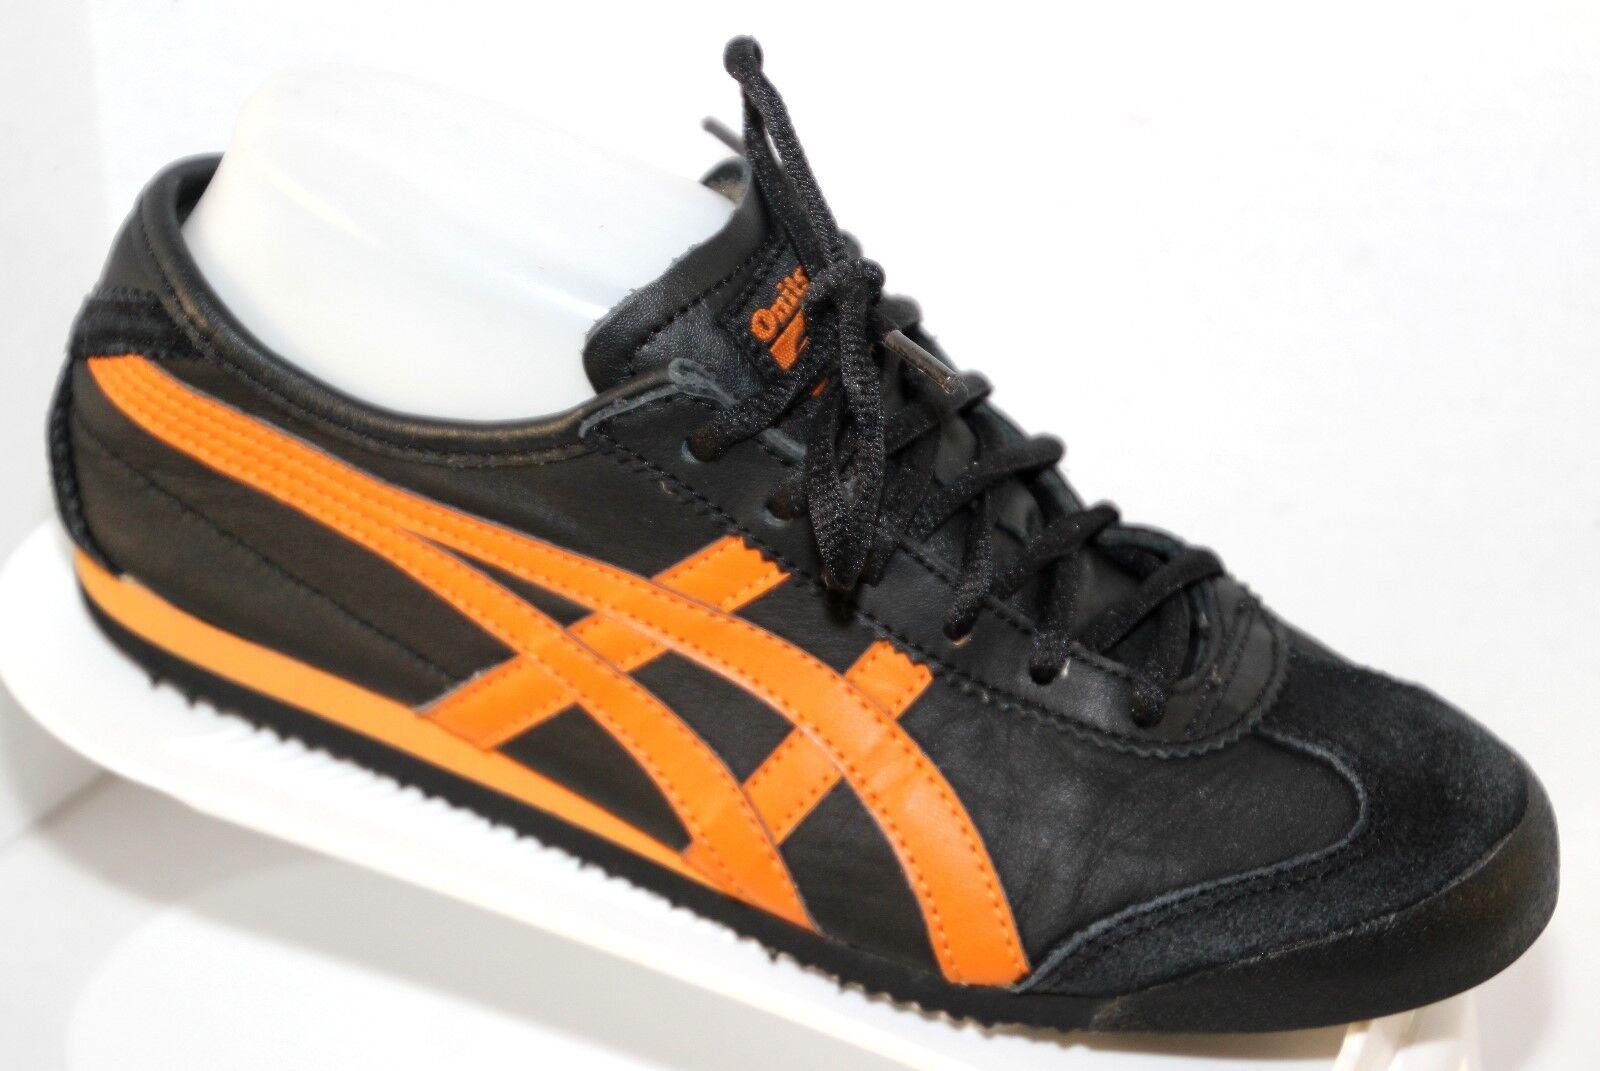 Asics Onitsuka Tiger  HL202   Black orange Leather Sneakers sz 6